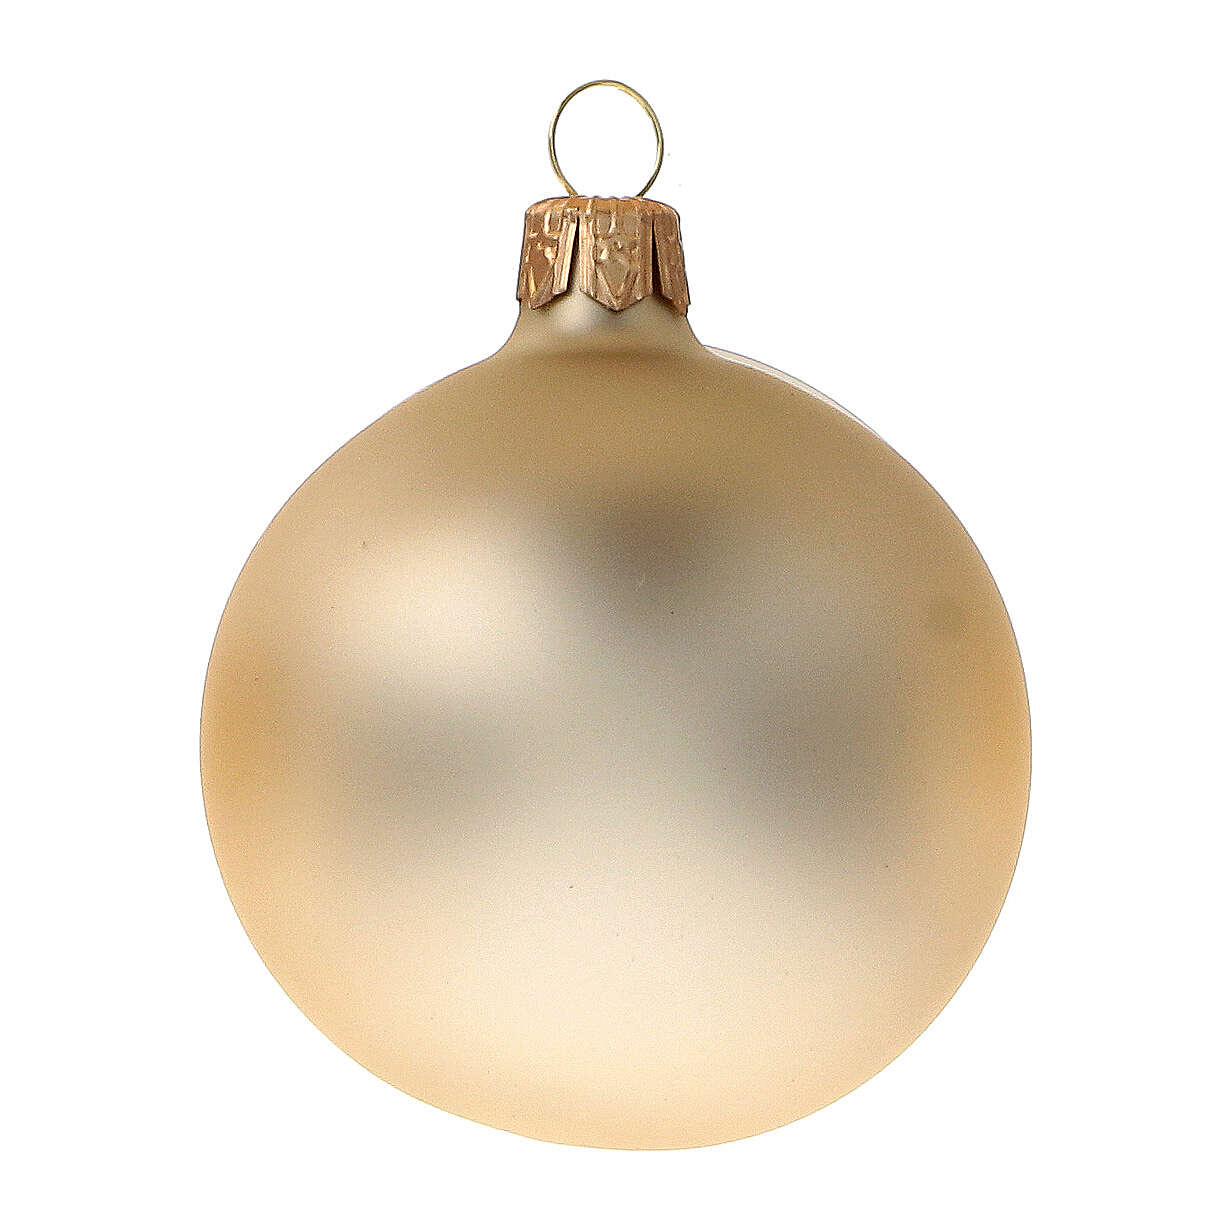 Gold Christmas balls 6 cm diameter matte blown glass, 6 pcs set 4